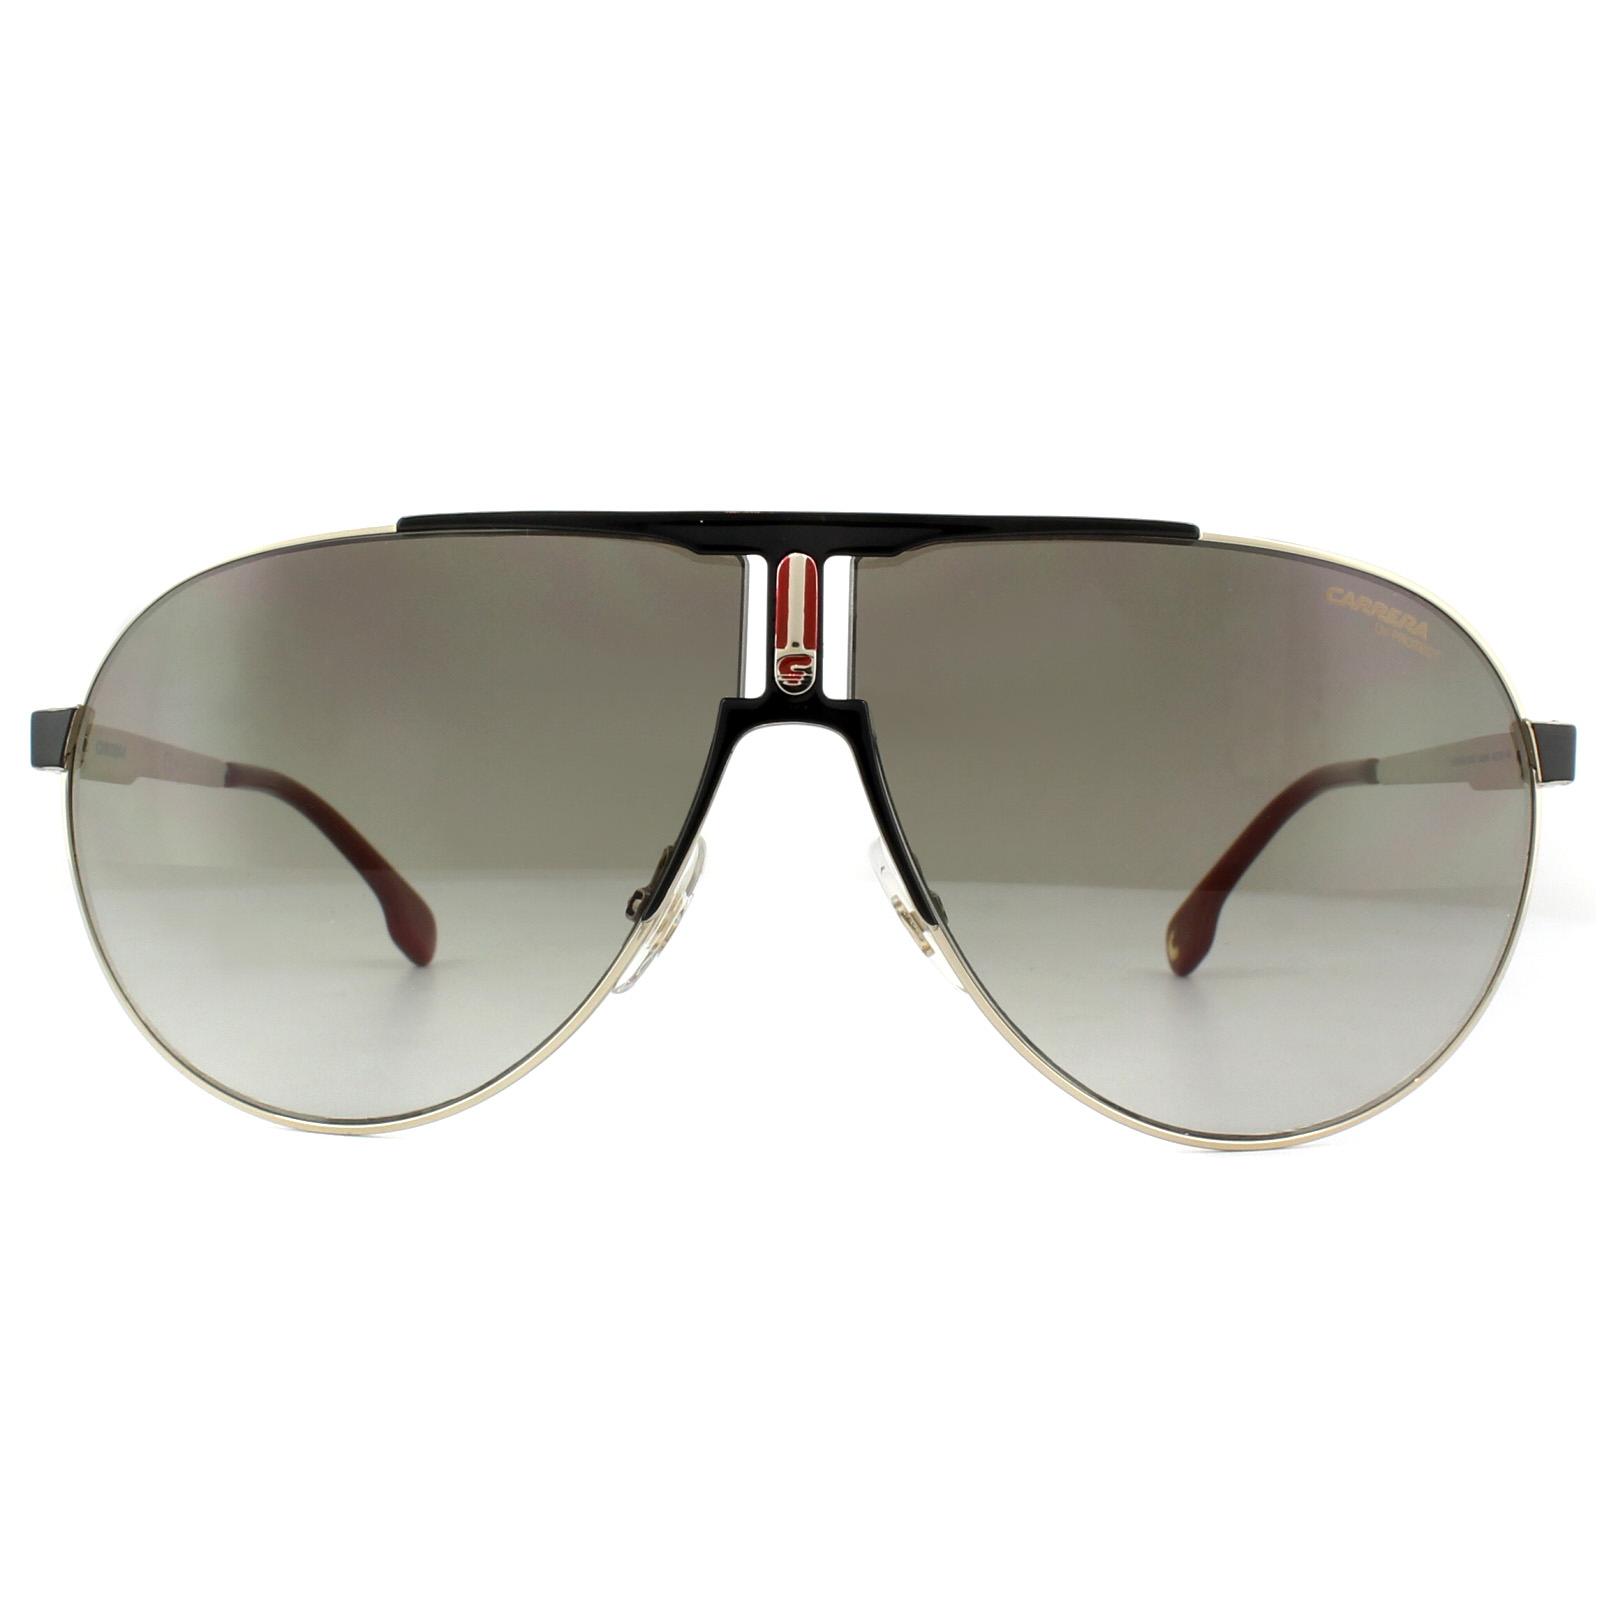 a65cc013679f61 Sentinel Carrera Sunglasses 1005 S 2M2 HA Gold Black Brown Gradient